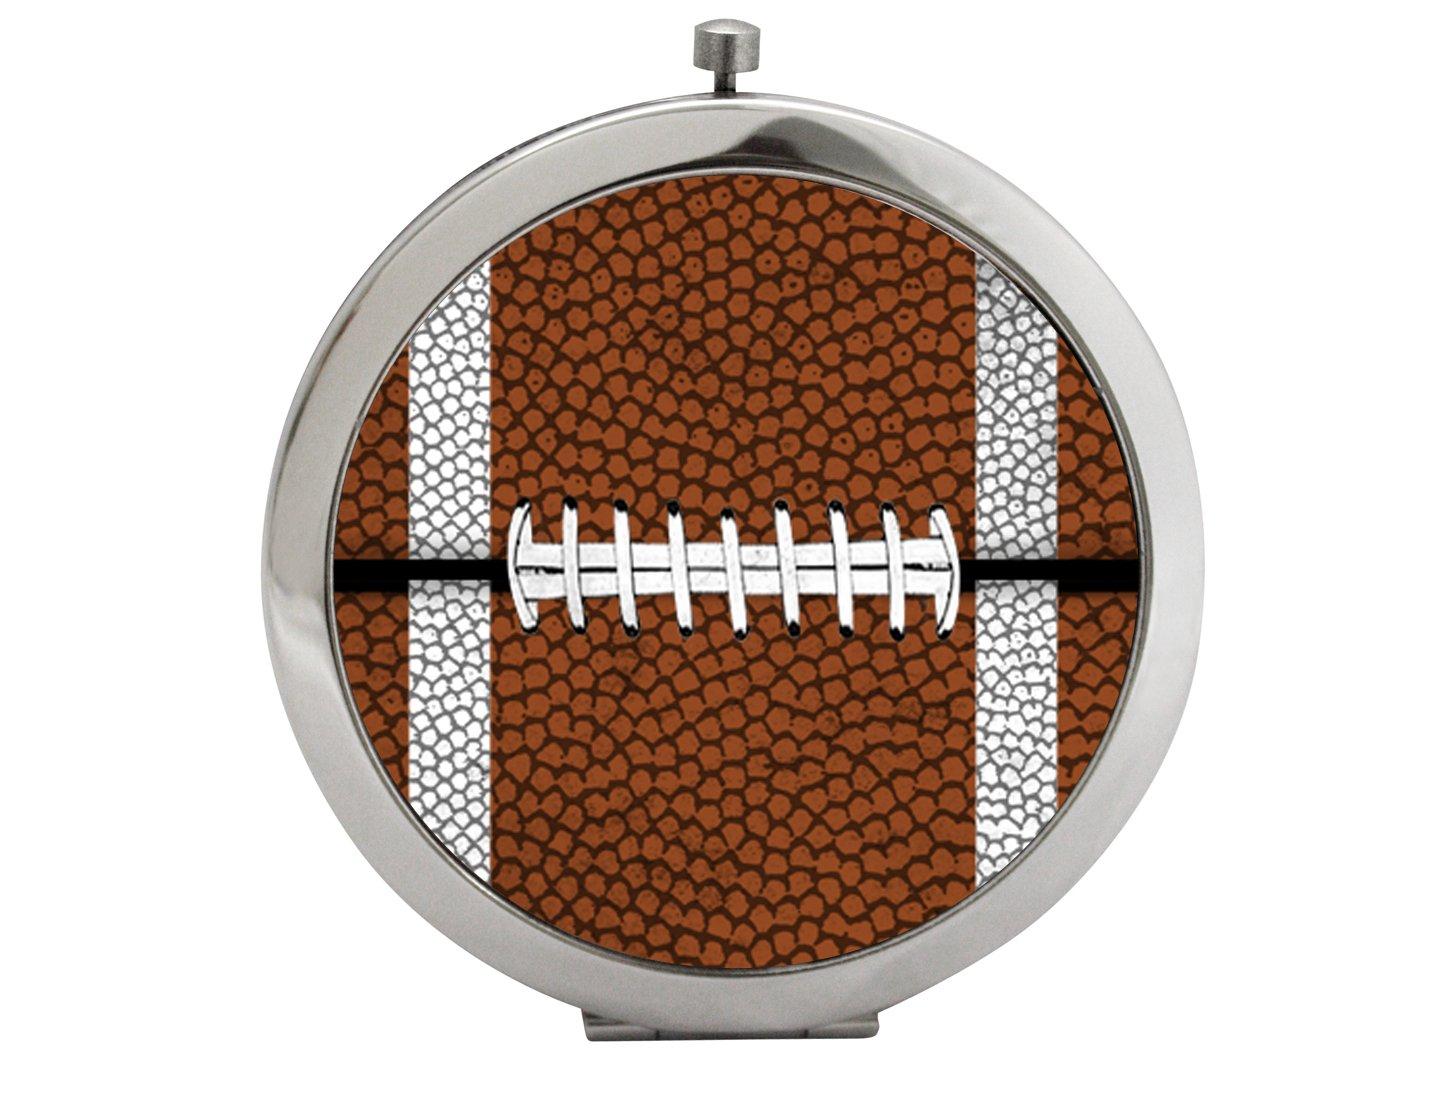 Snaptotes Football Design Compact Mirror